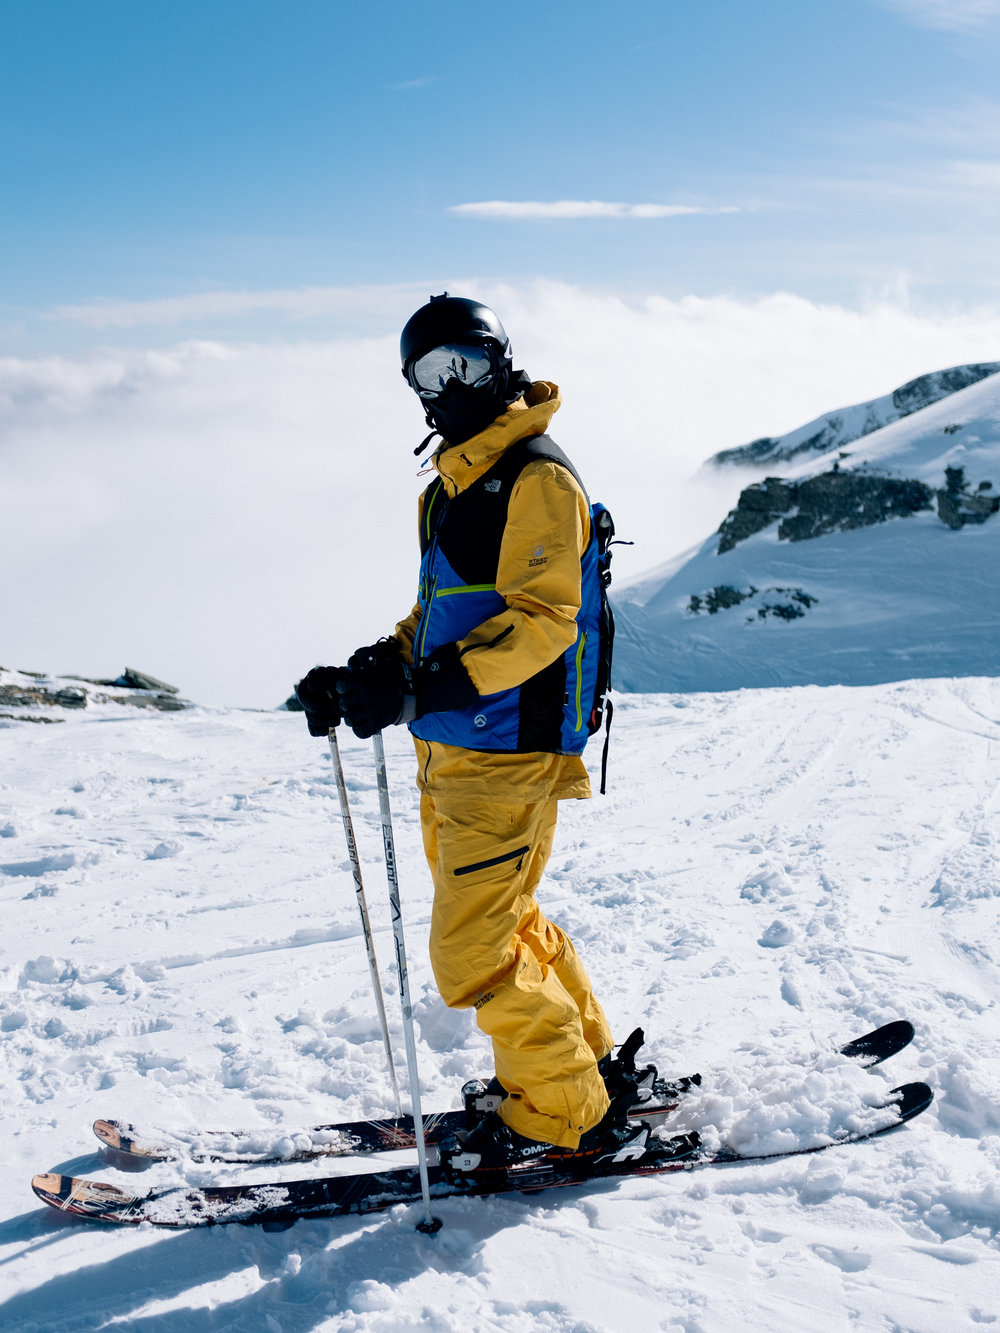 BenReadPhotography_Skiing_Alagna-29.jpg